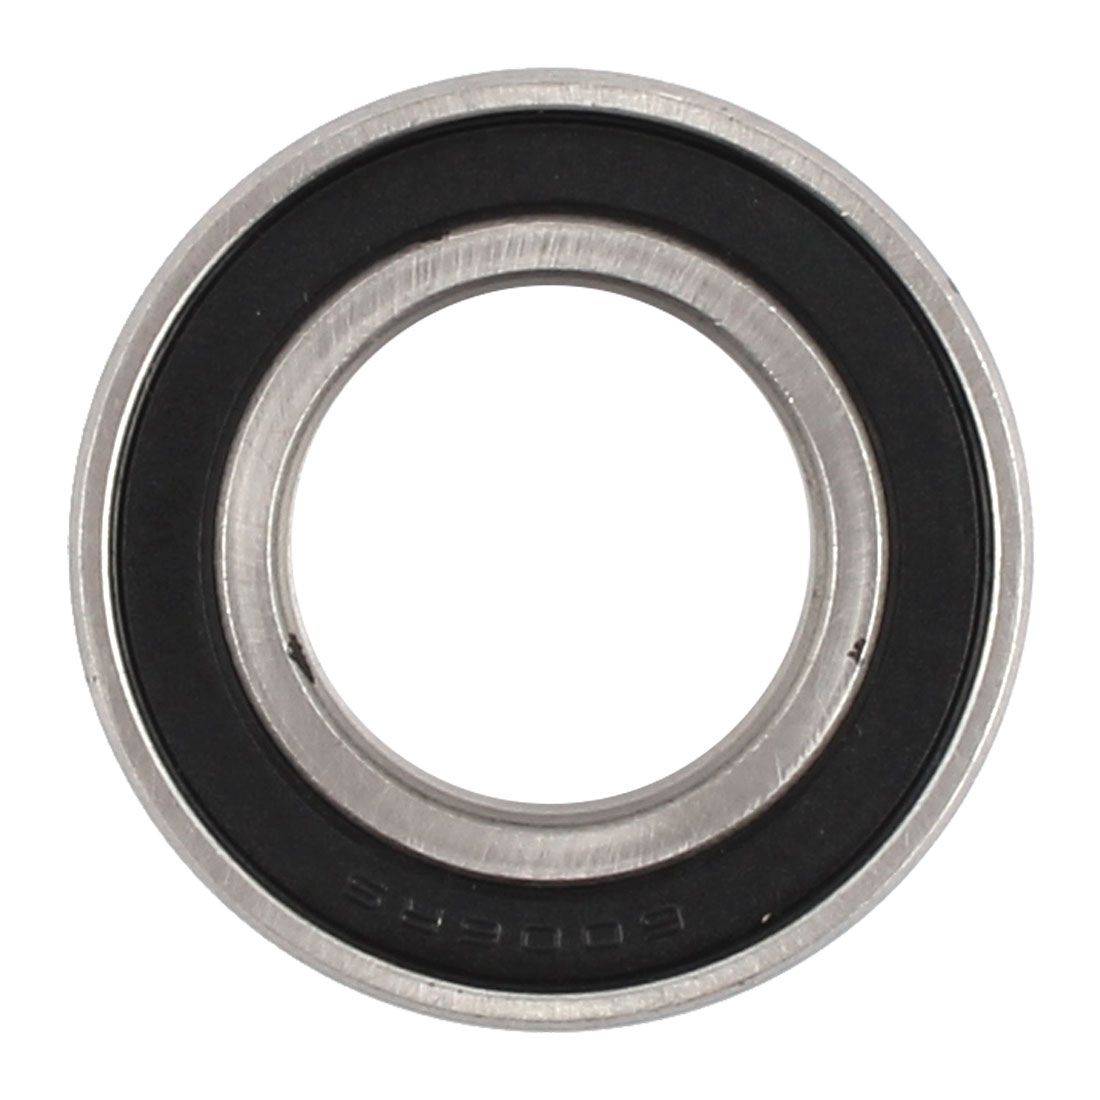 54mm x 31mm x 13mm 6006RS Sealing Rubber Groove Ball Wheel Bearings